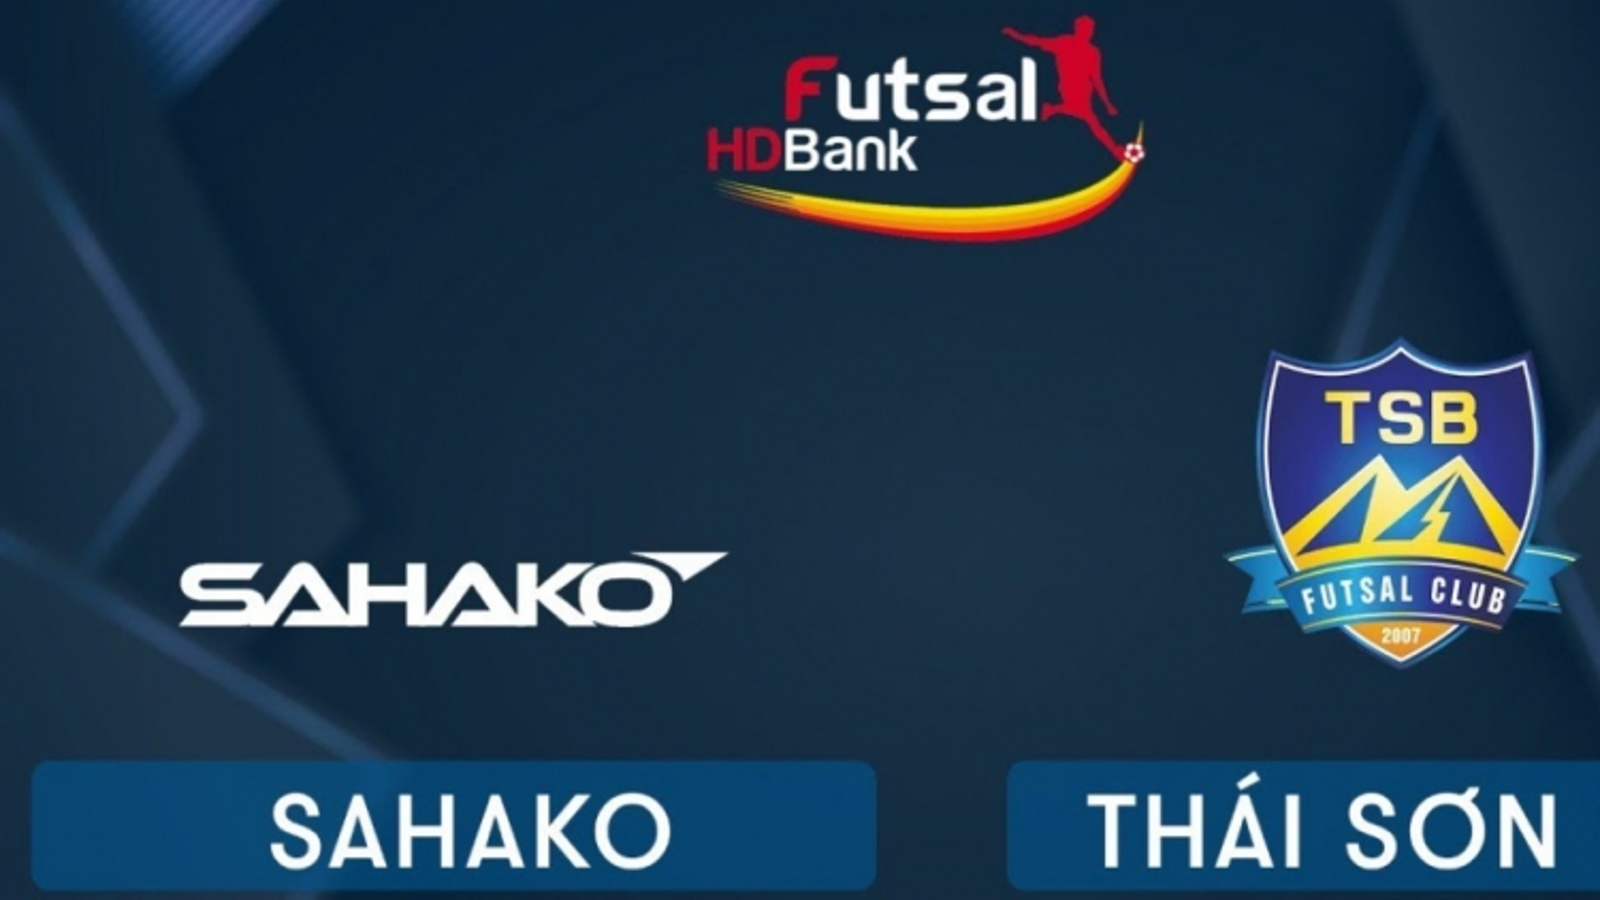 Xem trực tiếp Futsal HDBank VĐQG 2020: Sahako - Thái Sơn Bắc